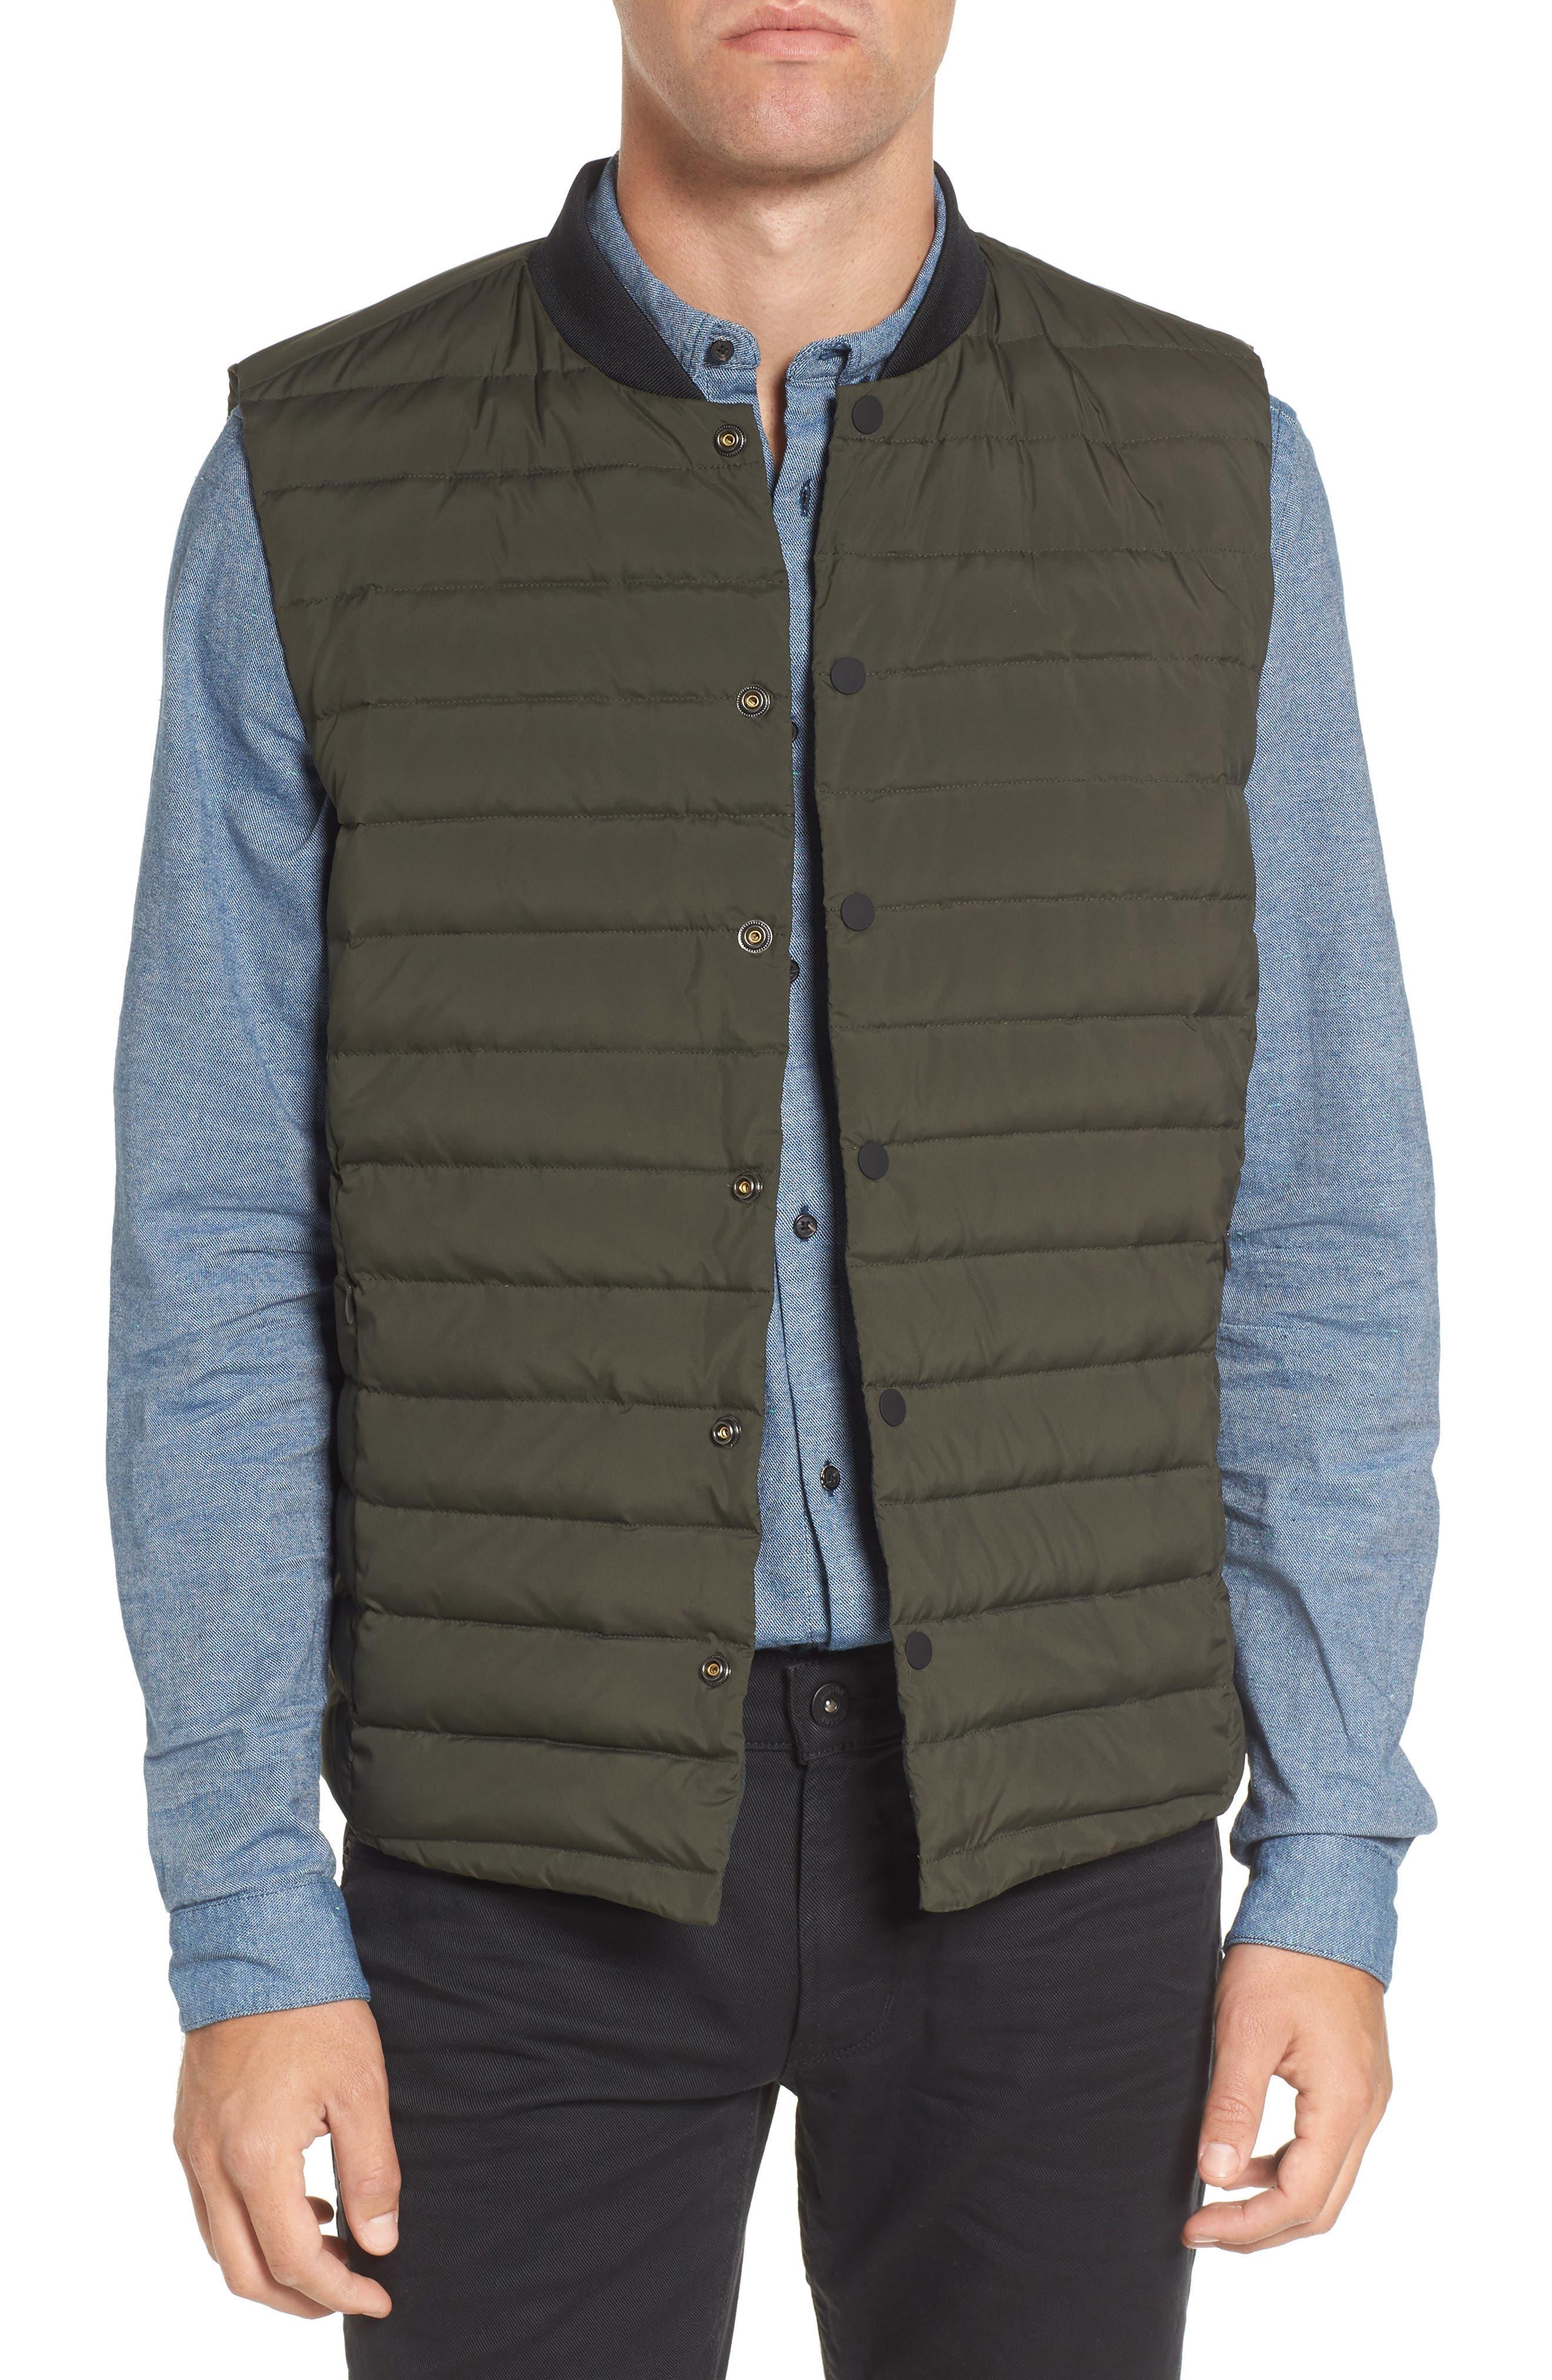 Alternate Image 1 Selected - Scotch & Soda Down Vest